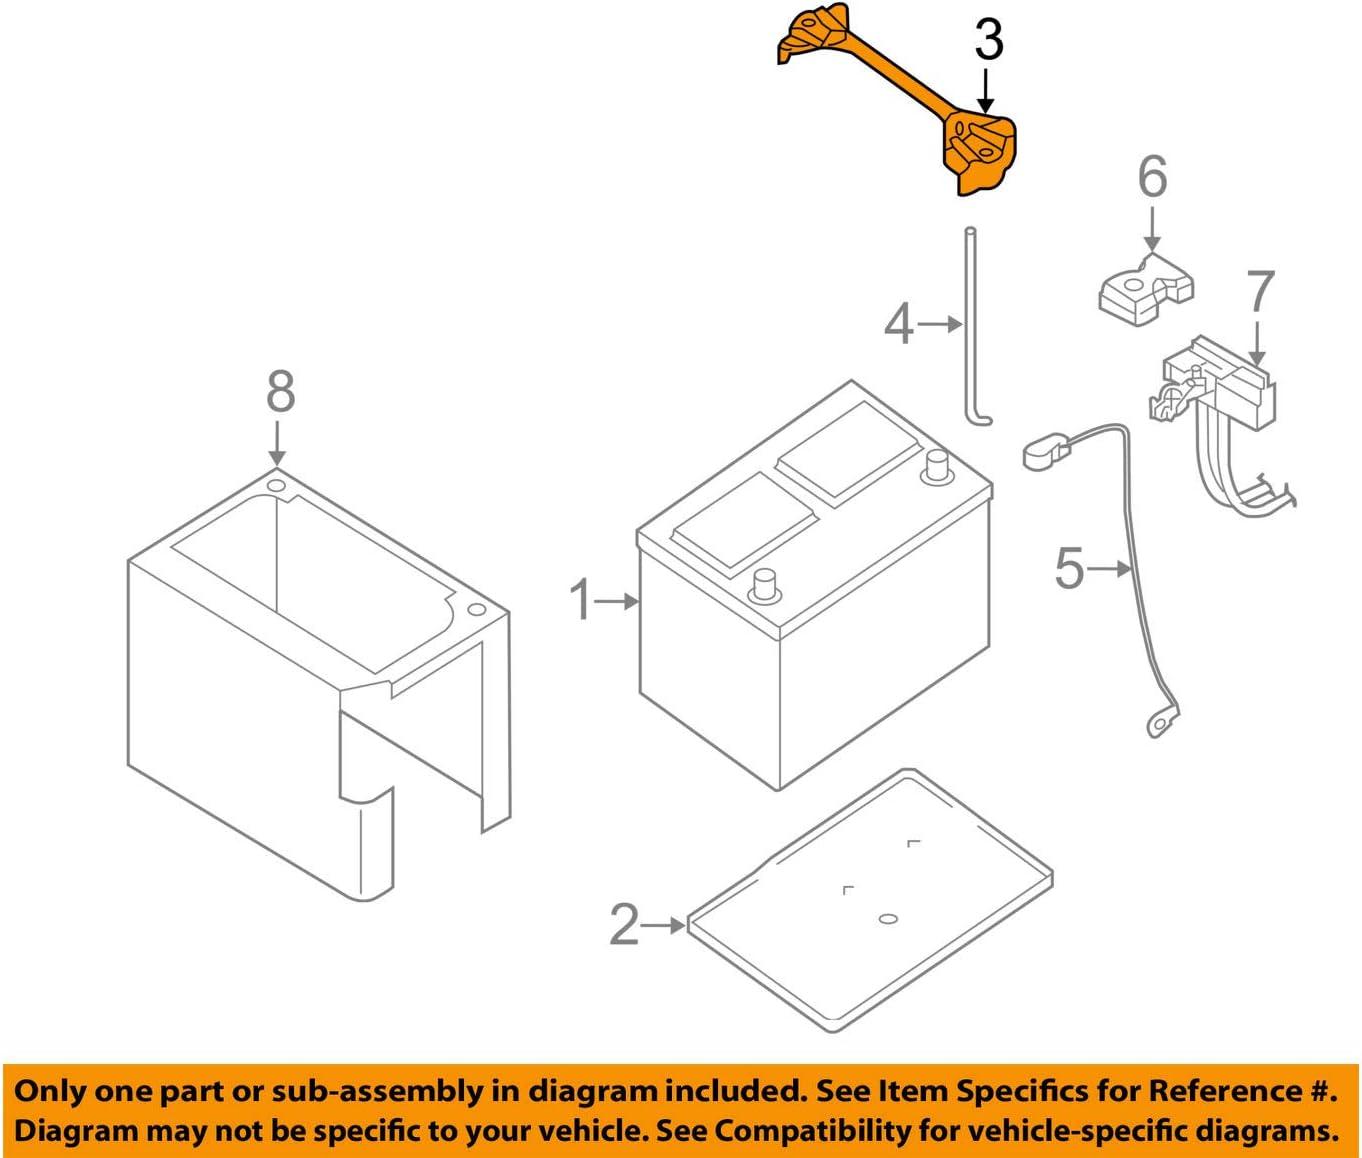 amazon.com: genuine nissan parts - battery frame (24427-zx60a), regular:  automotive  amazon.com